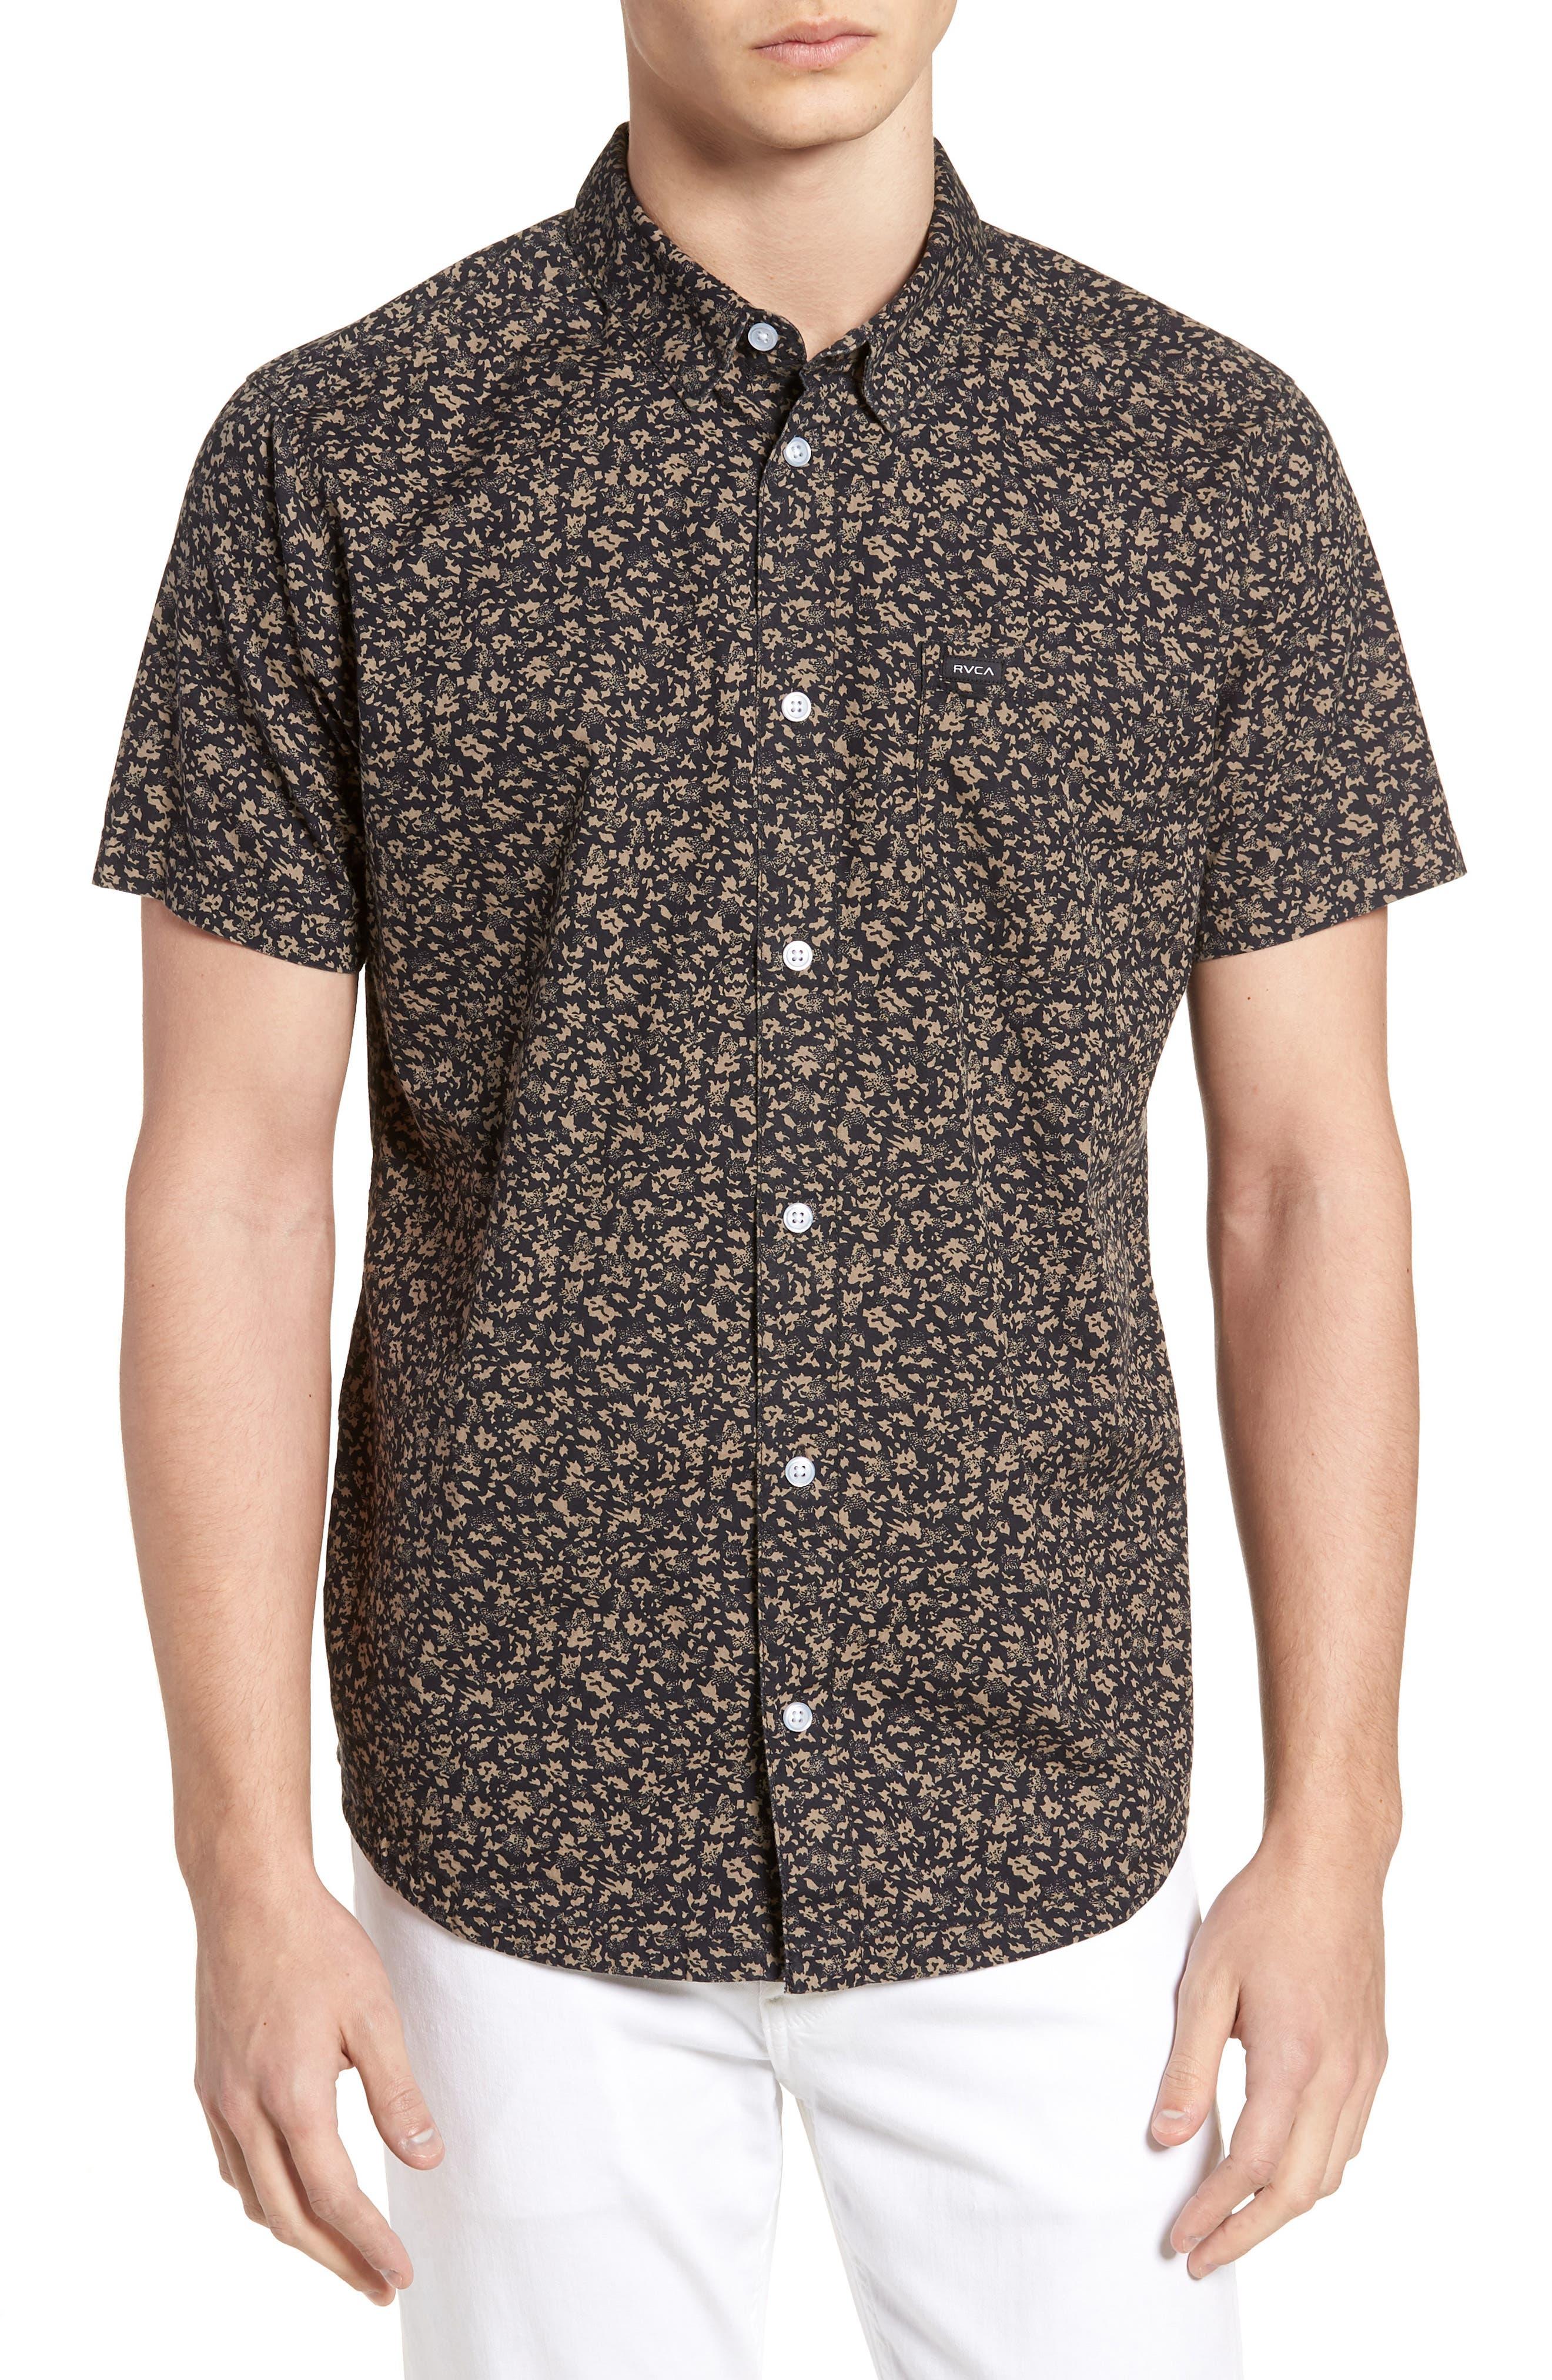 Dresden Woven Shirt,                         Main,                         color, Pirate Black